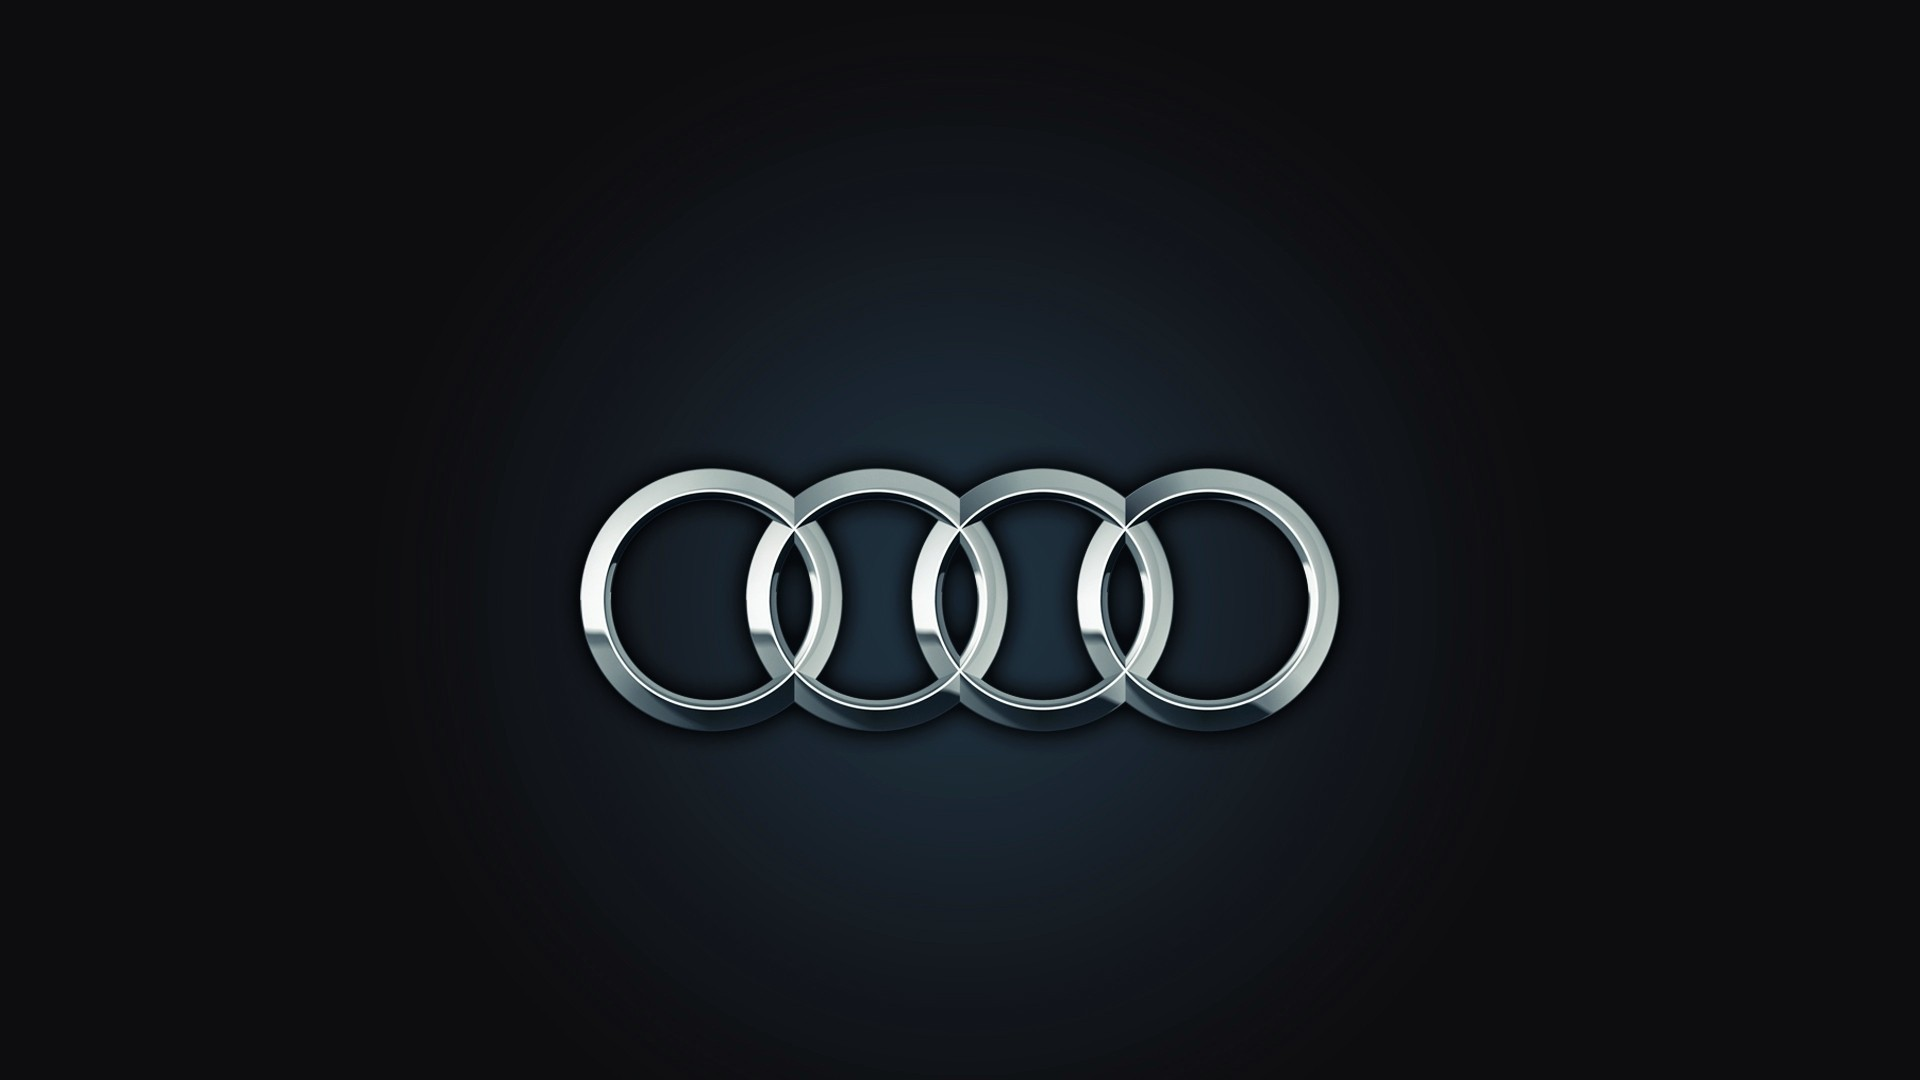 Download Audi Logo Cool HD Wallpapers